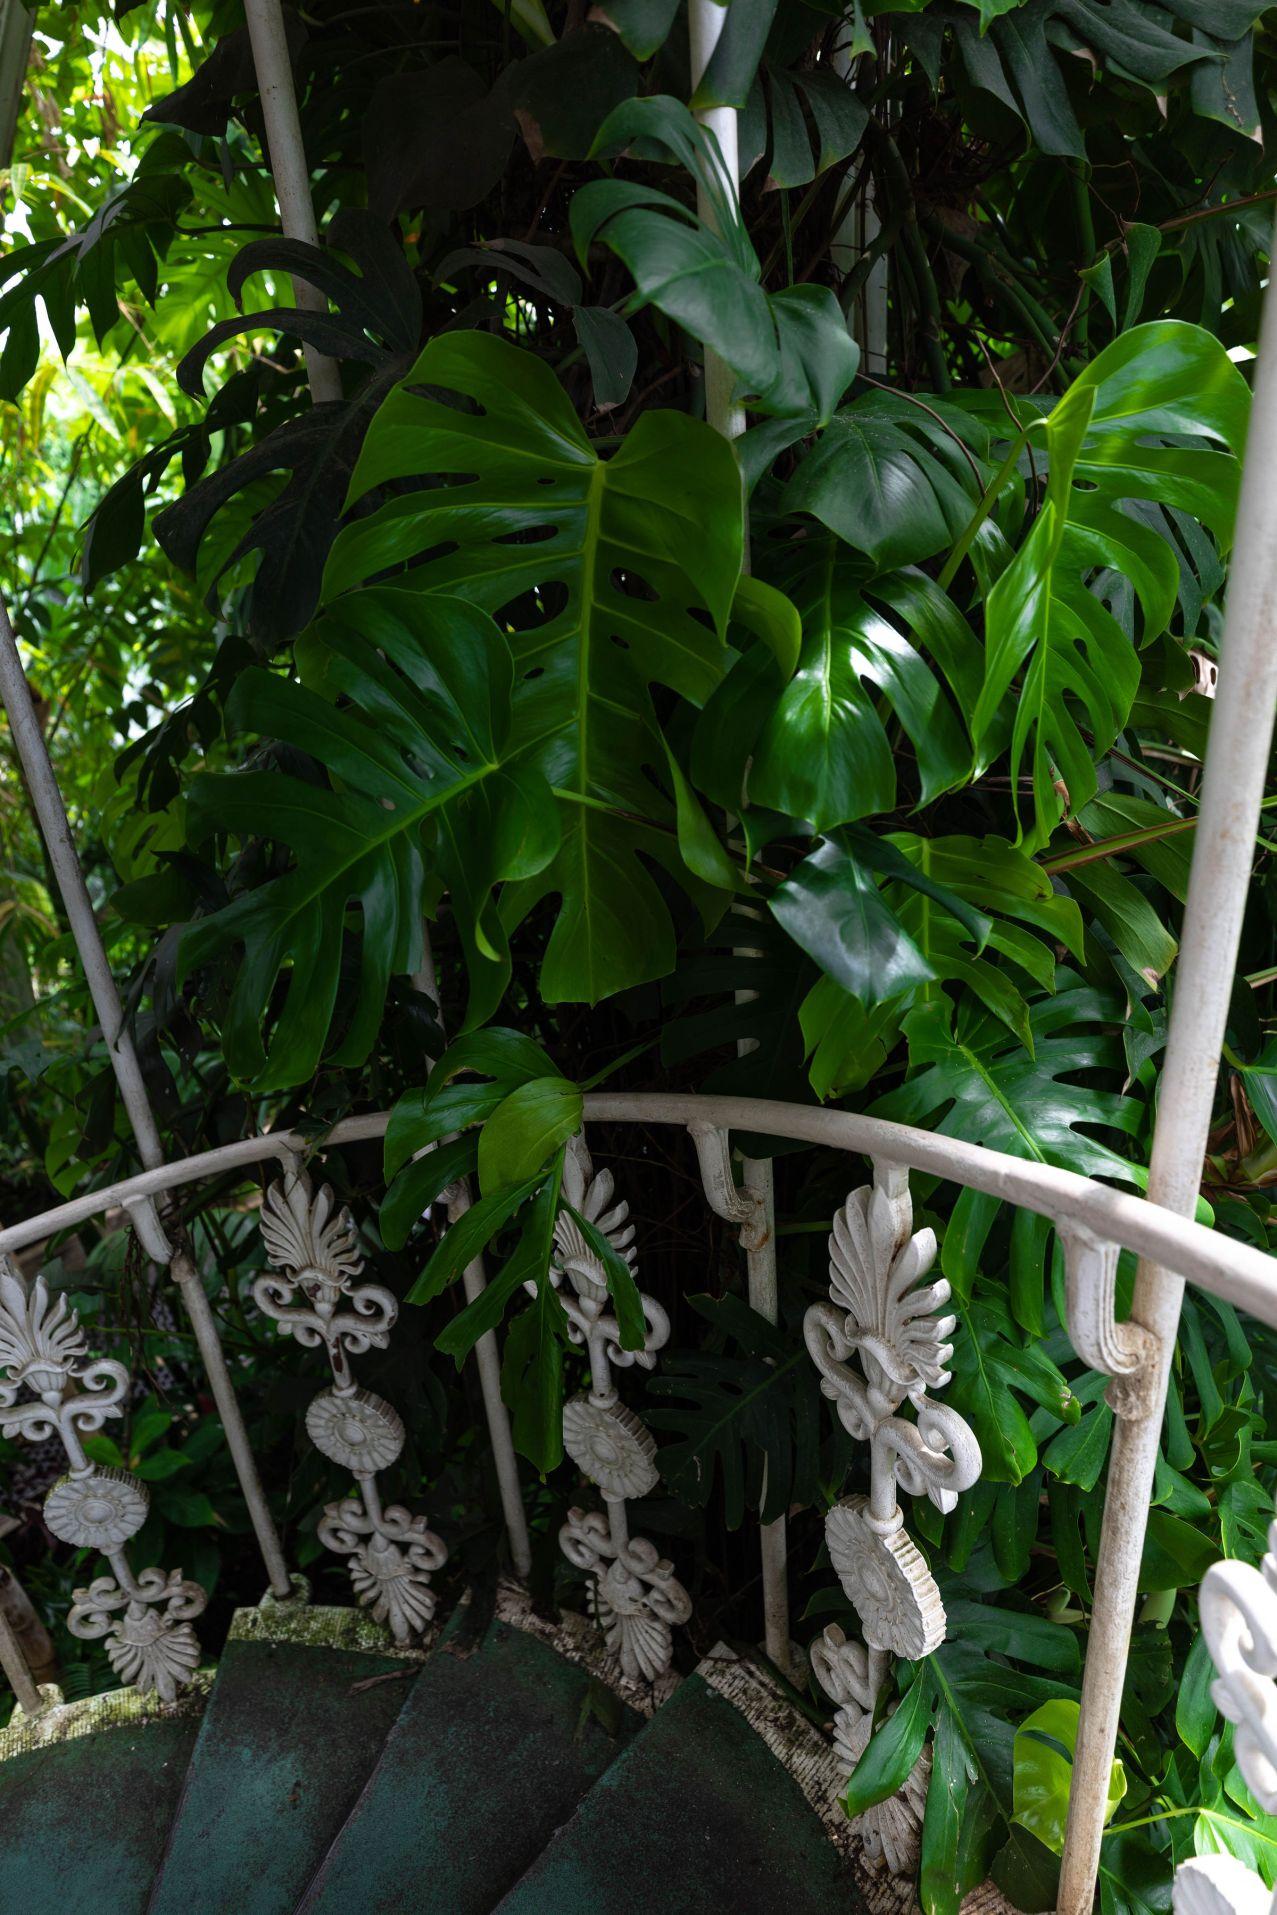 Royal Botanical Gardens, Kew in London, England, United Kingdom Beautiful Gardens of the World Things to Do in London English Botanical Gardens